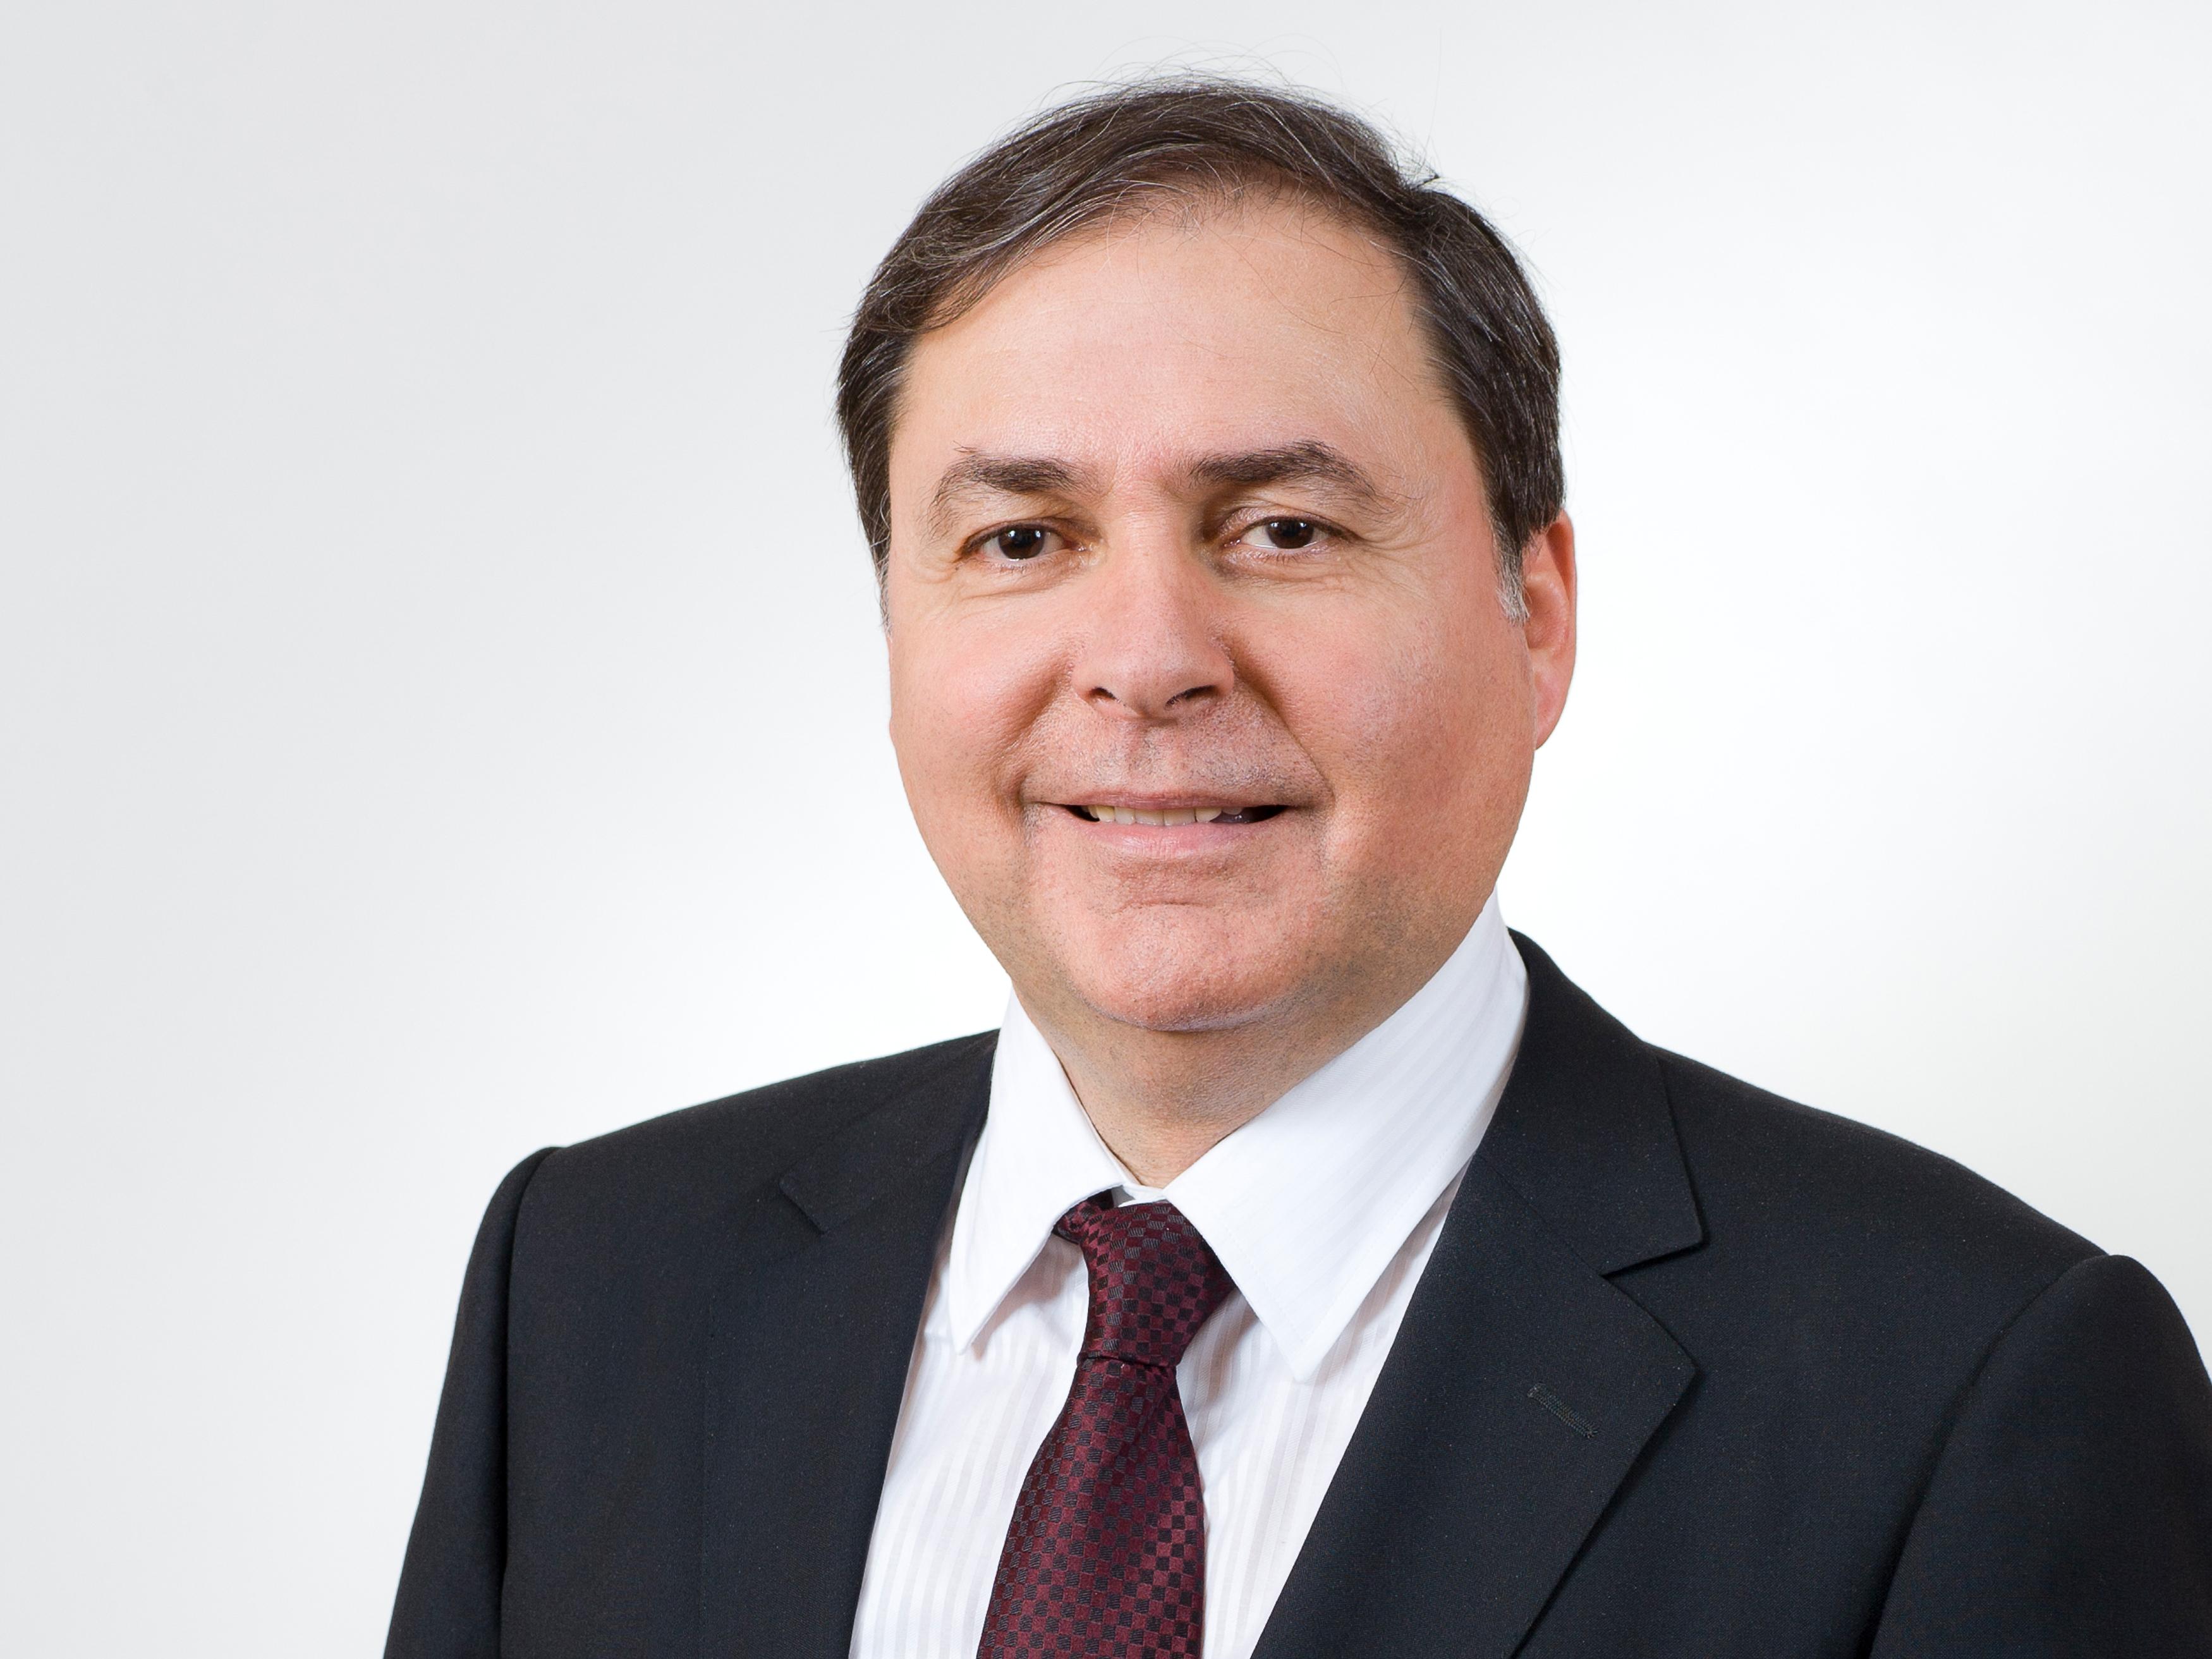 Mario Suozzi